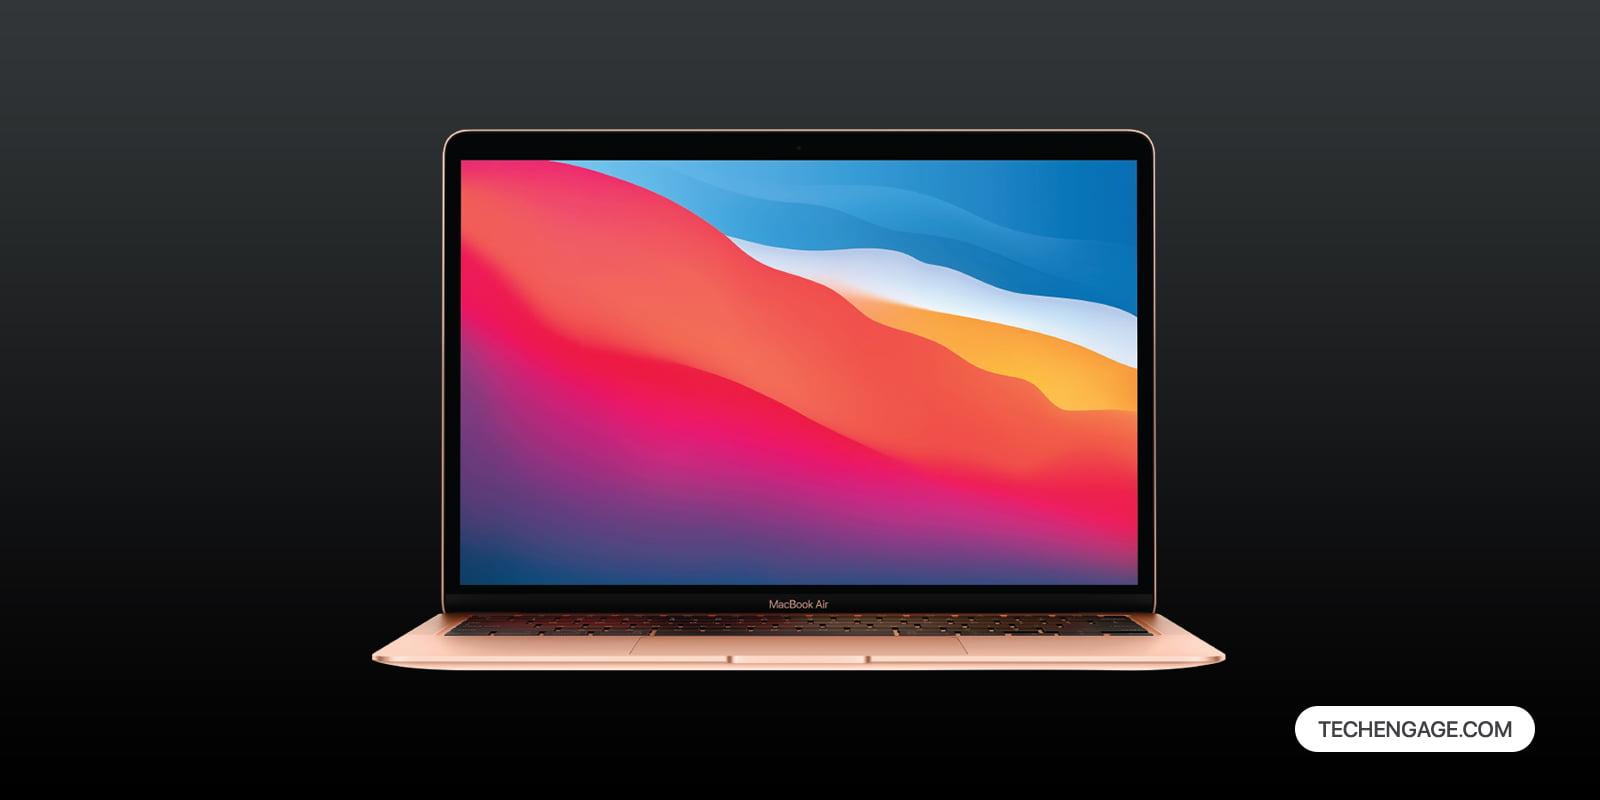 An image of MacBook M1